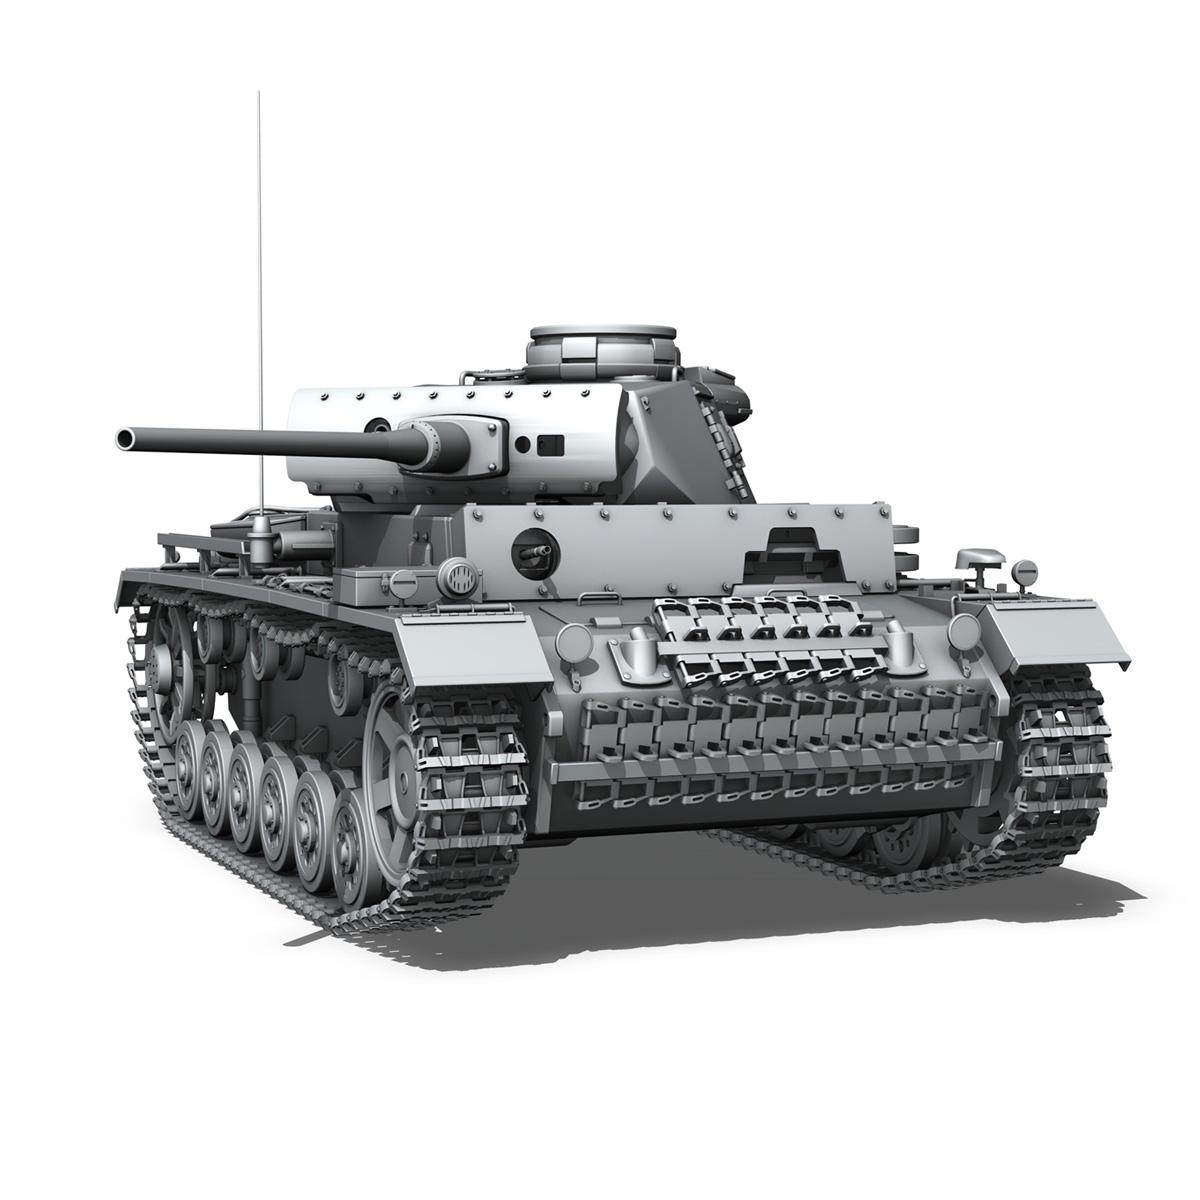 pzkpfw iii – panzerkampfwagen iii – ausf.l 3d model 3ds fbx c4d lwo obj 252161